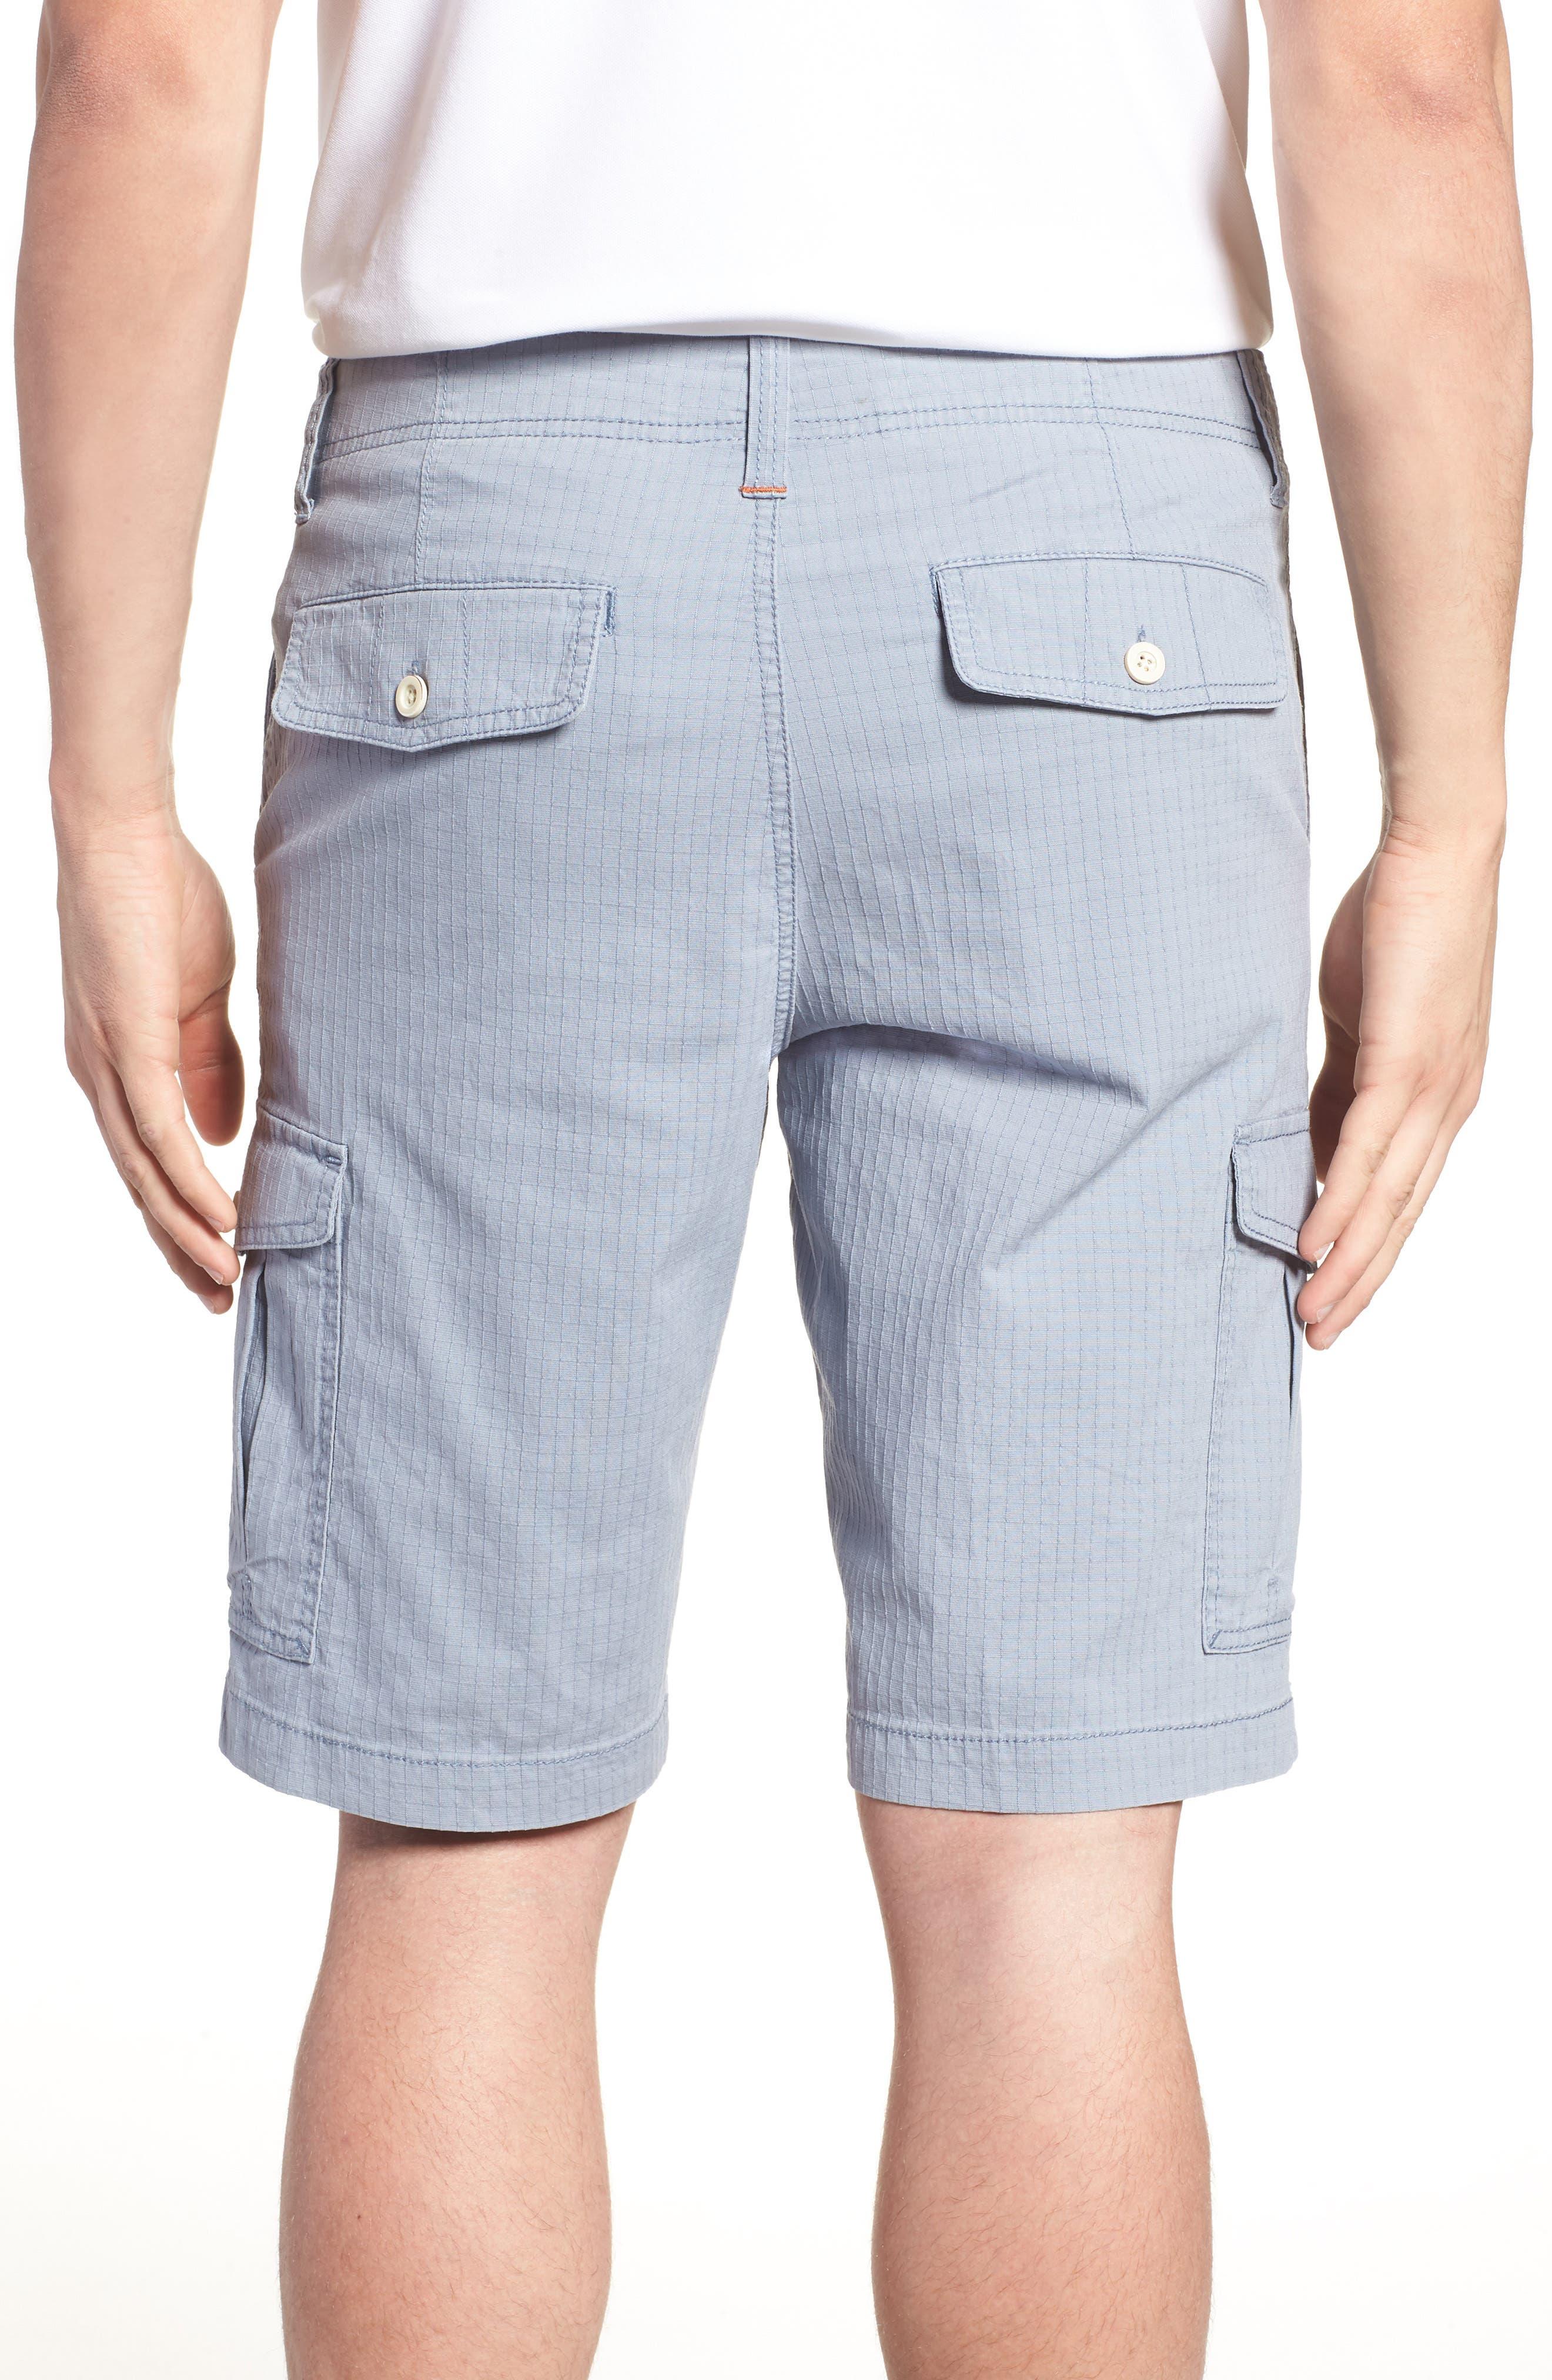 Sandbar Ripstop Cargo Shorts,                             Alternate thumbnail 2, color,                             401